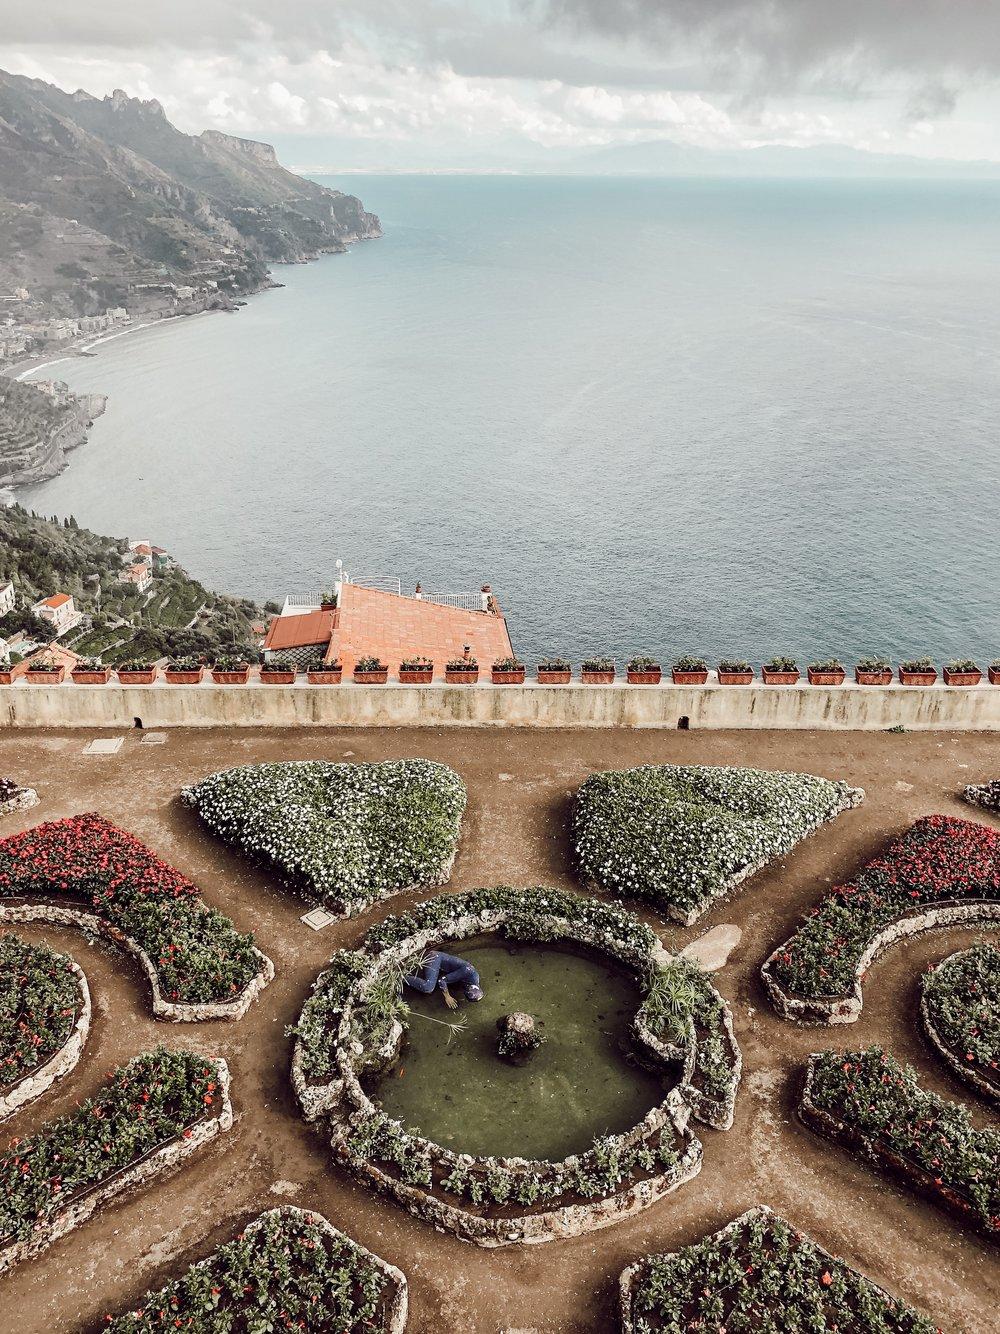 Villa Rufolo Ravello Italy | Three Days on the Amalfi Coast, Amalfi Travel Guide, What to Do in Amalfi Italy | Miranda Schroeder Blog